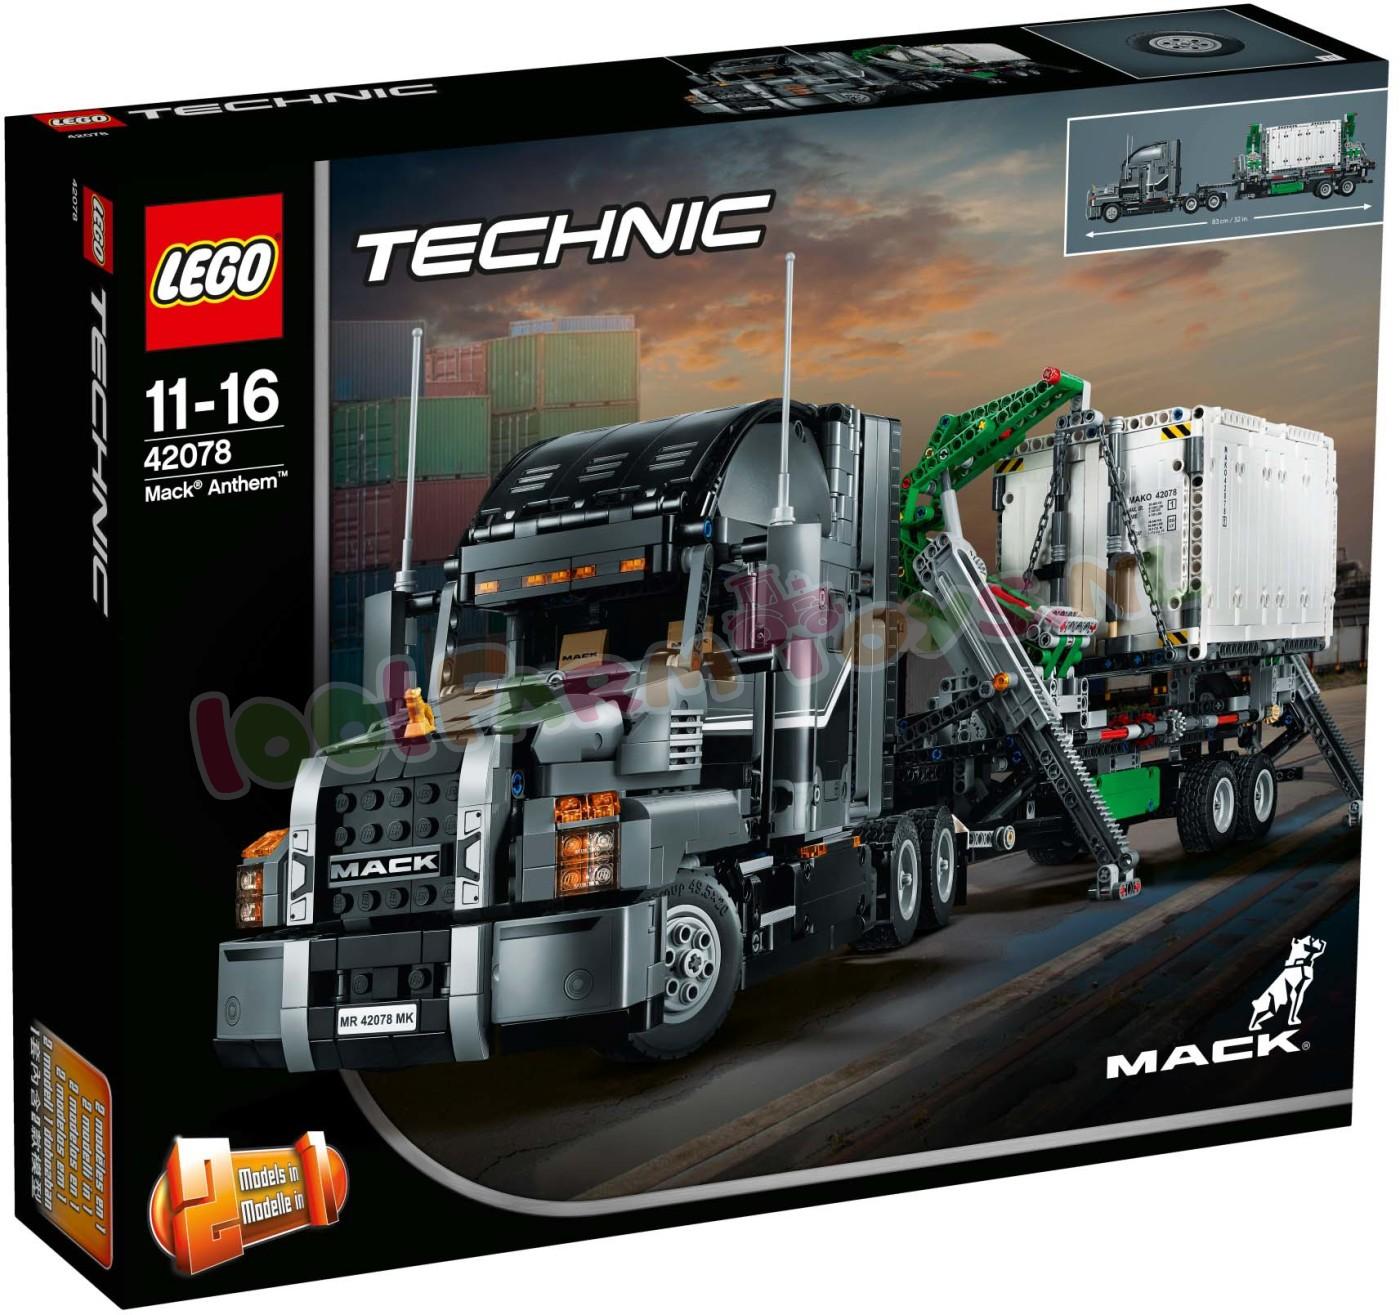 Uitgelezene LEGO TECHNIC MACK ANTHEM VRACHTWAGEN - 42078 - LEGO Technic - LEGO VP-32